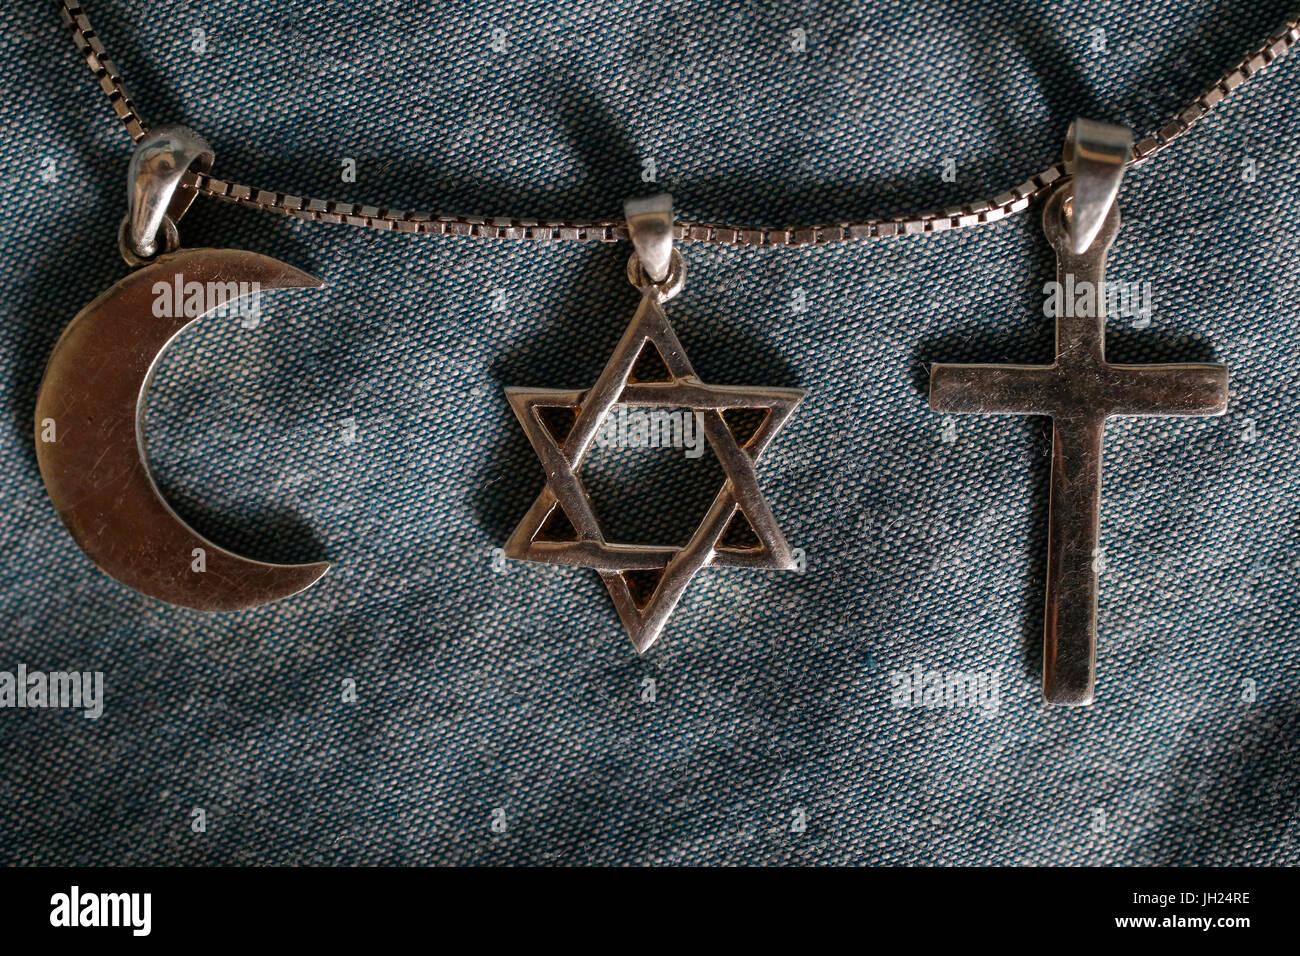 Symbols of islam, judaism and christianity. Stock Photo